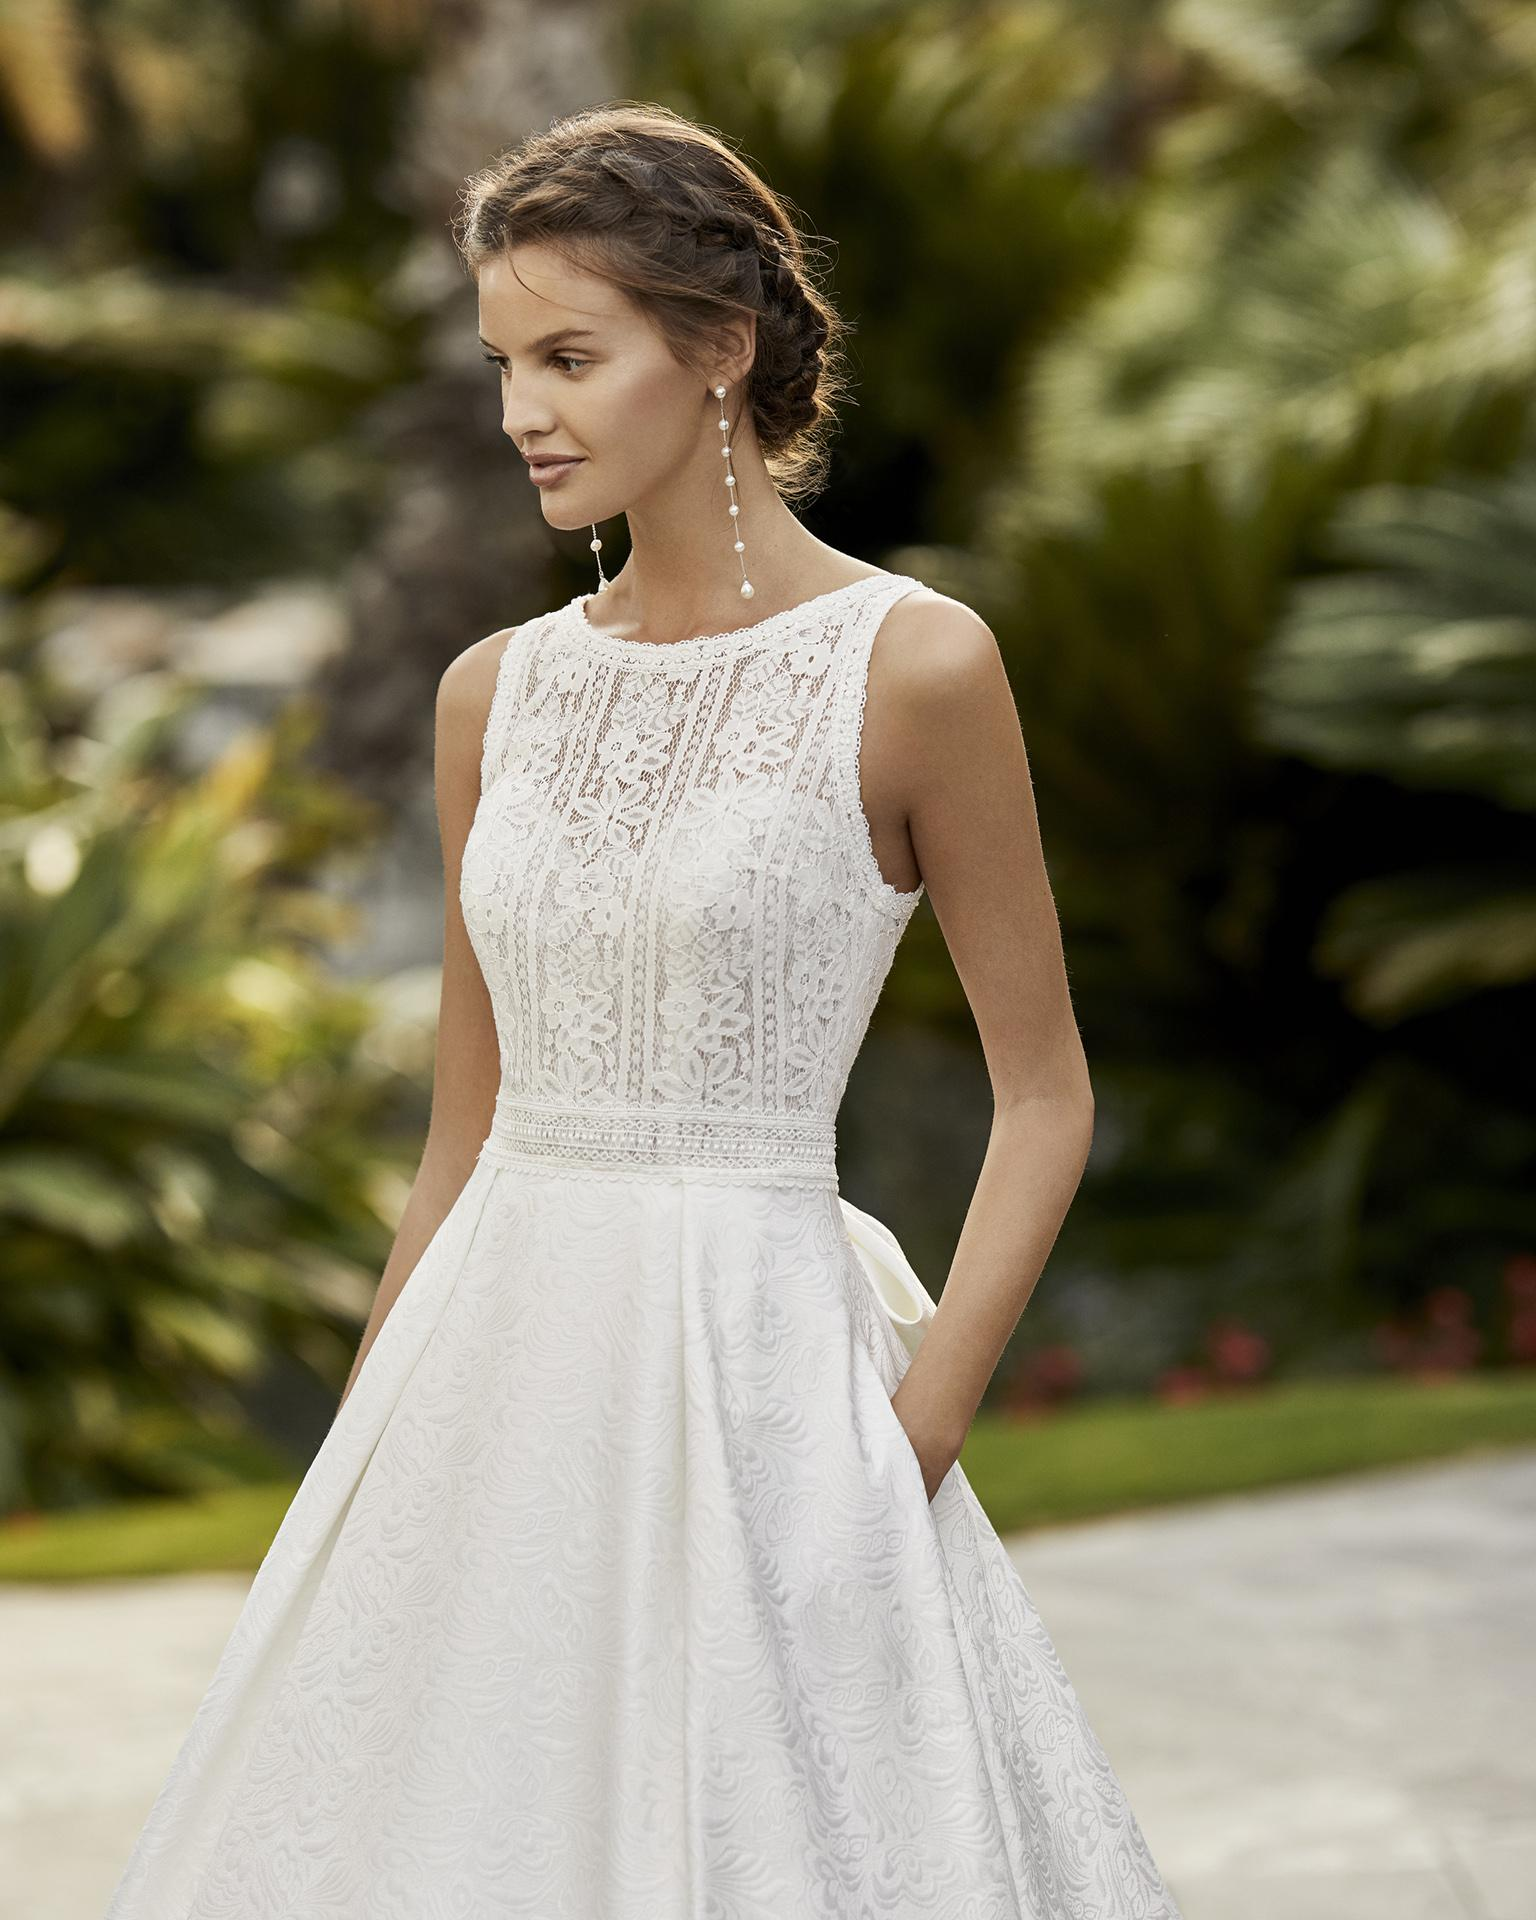 svatbyzbraslav - ZUNIL svatební šaty od Ariana Alier by Rosa Clara